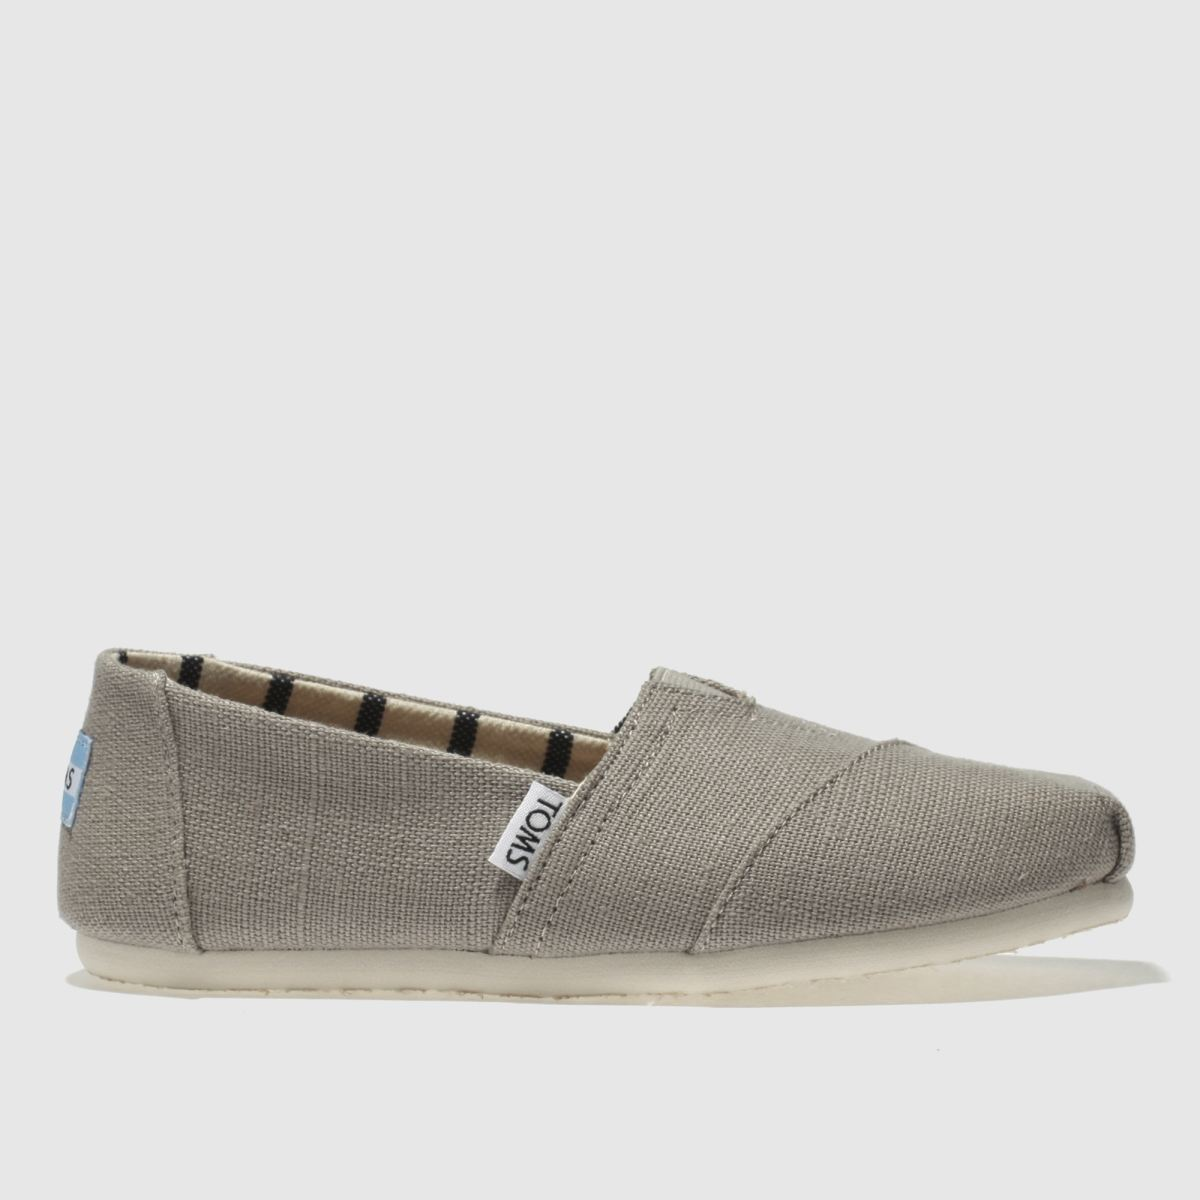 Toms Light Grey Alpargata Venice Flat Shoes